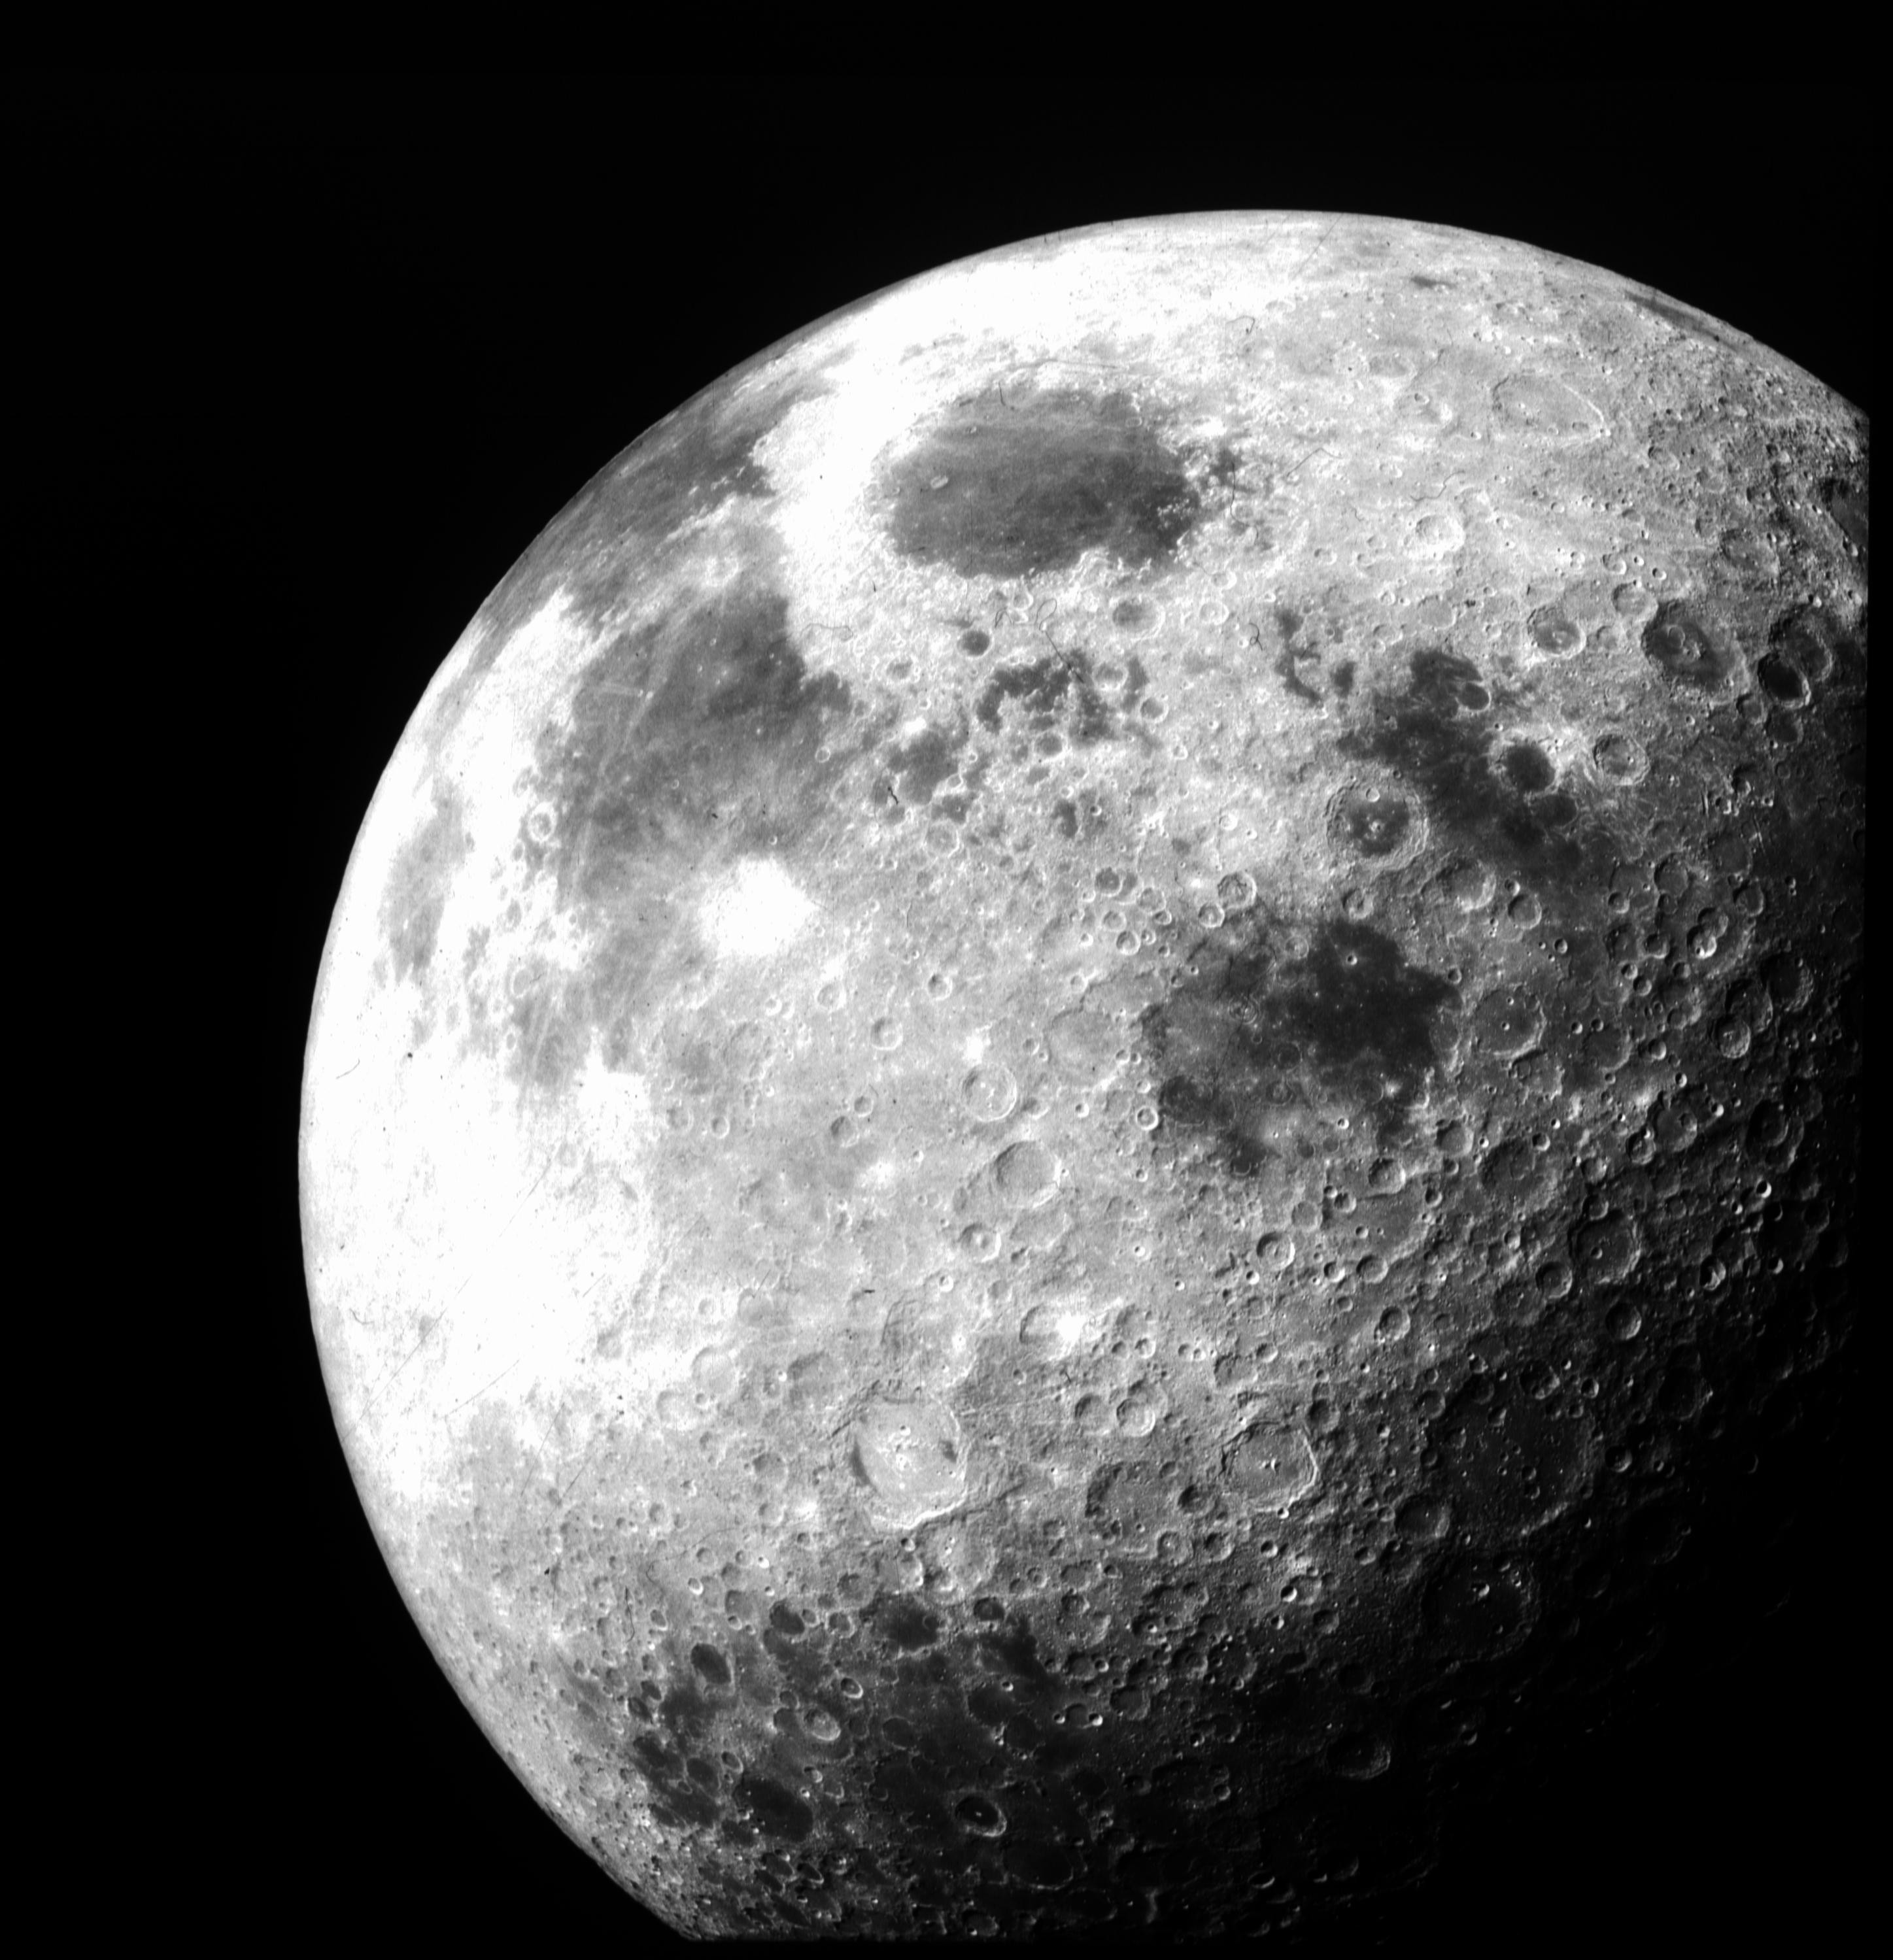 moon observation nasa - photo #19